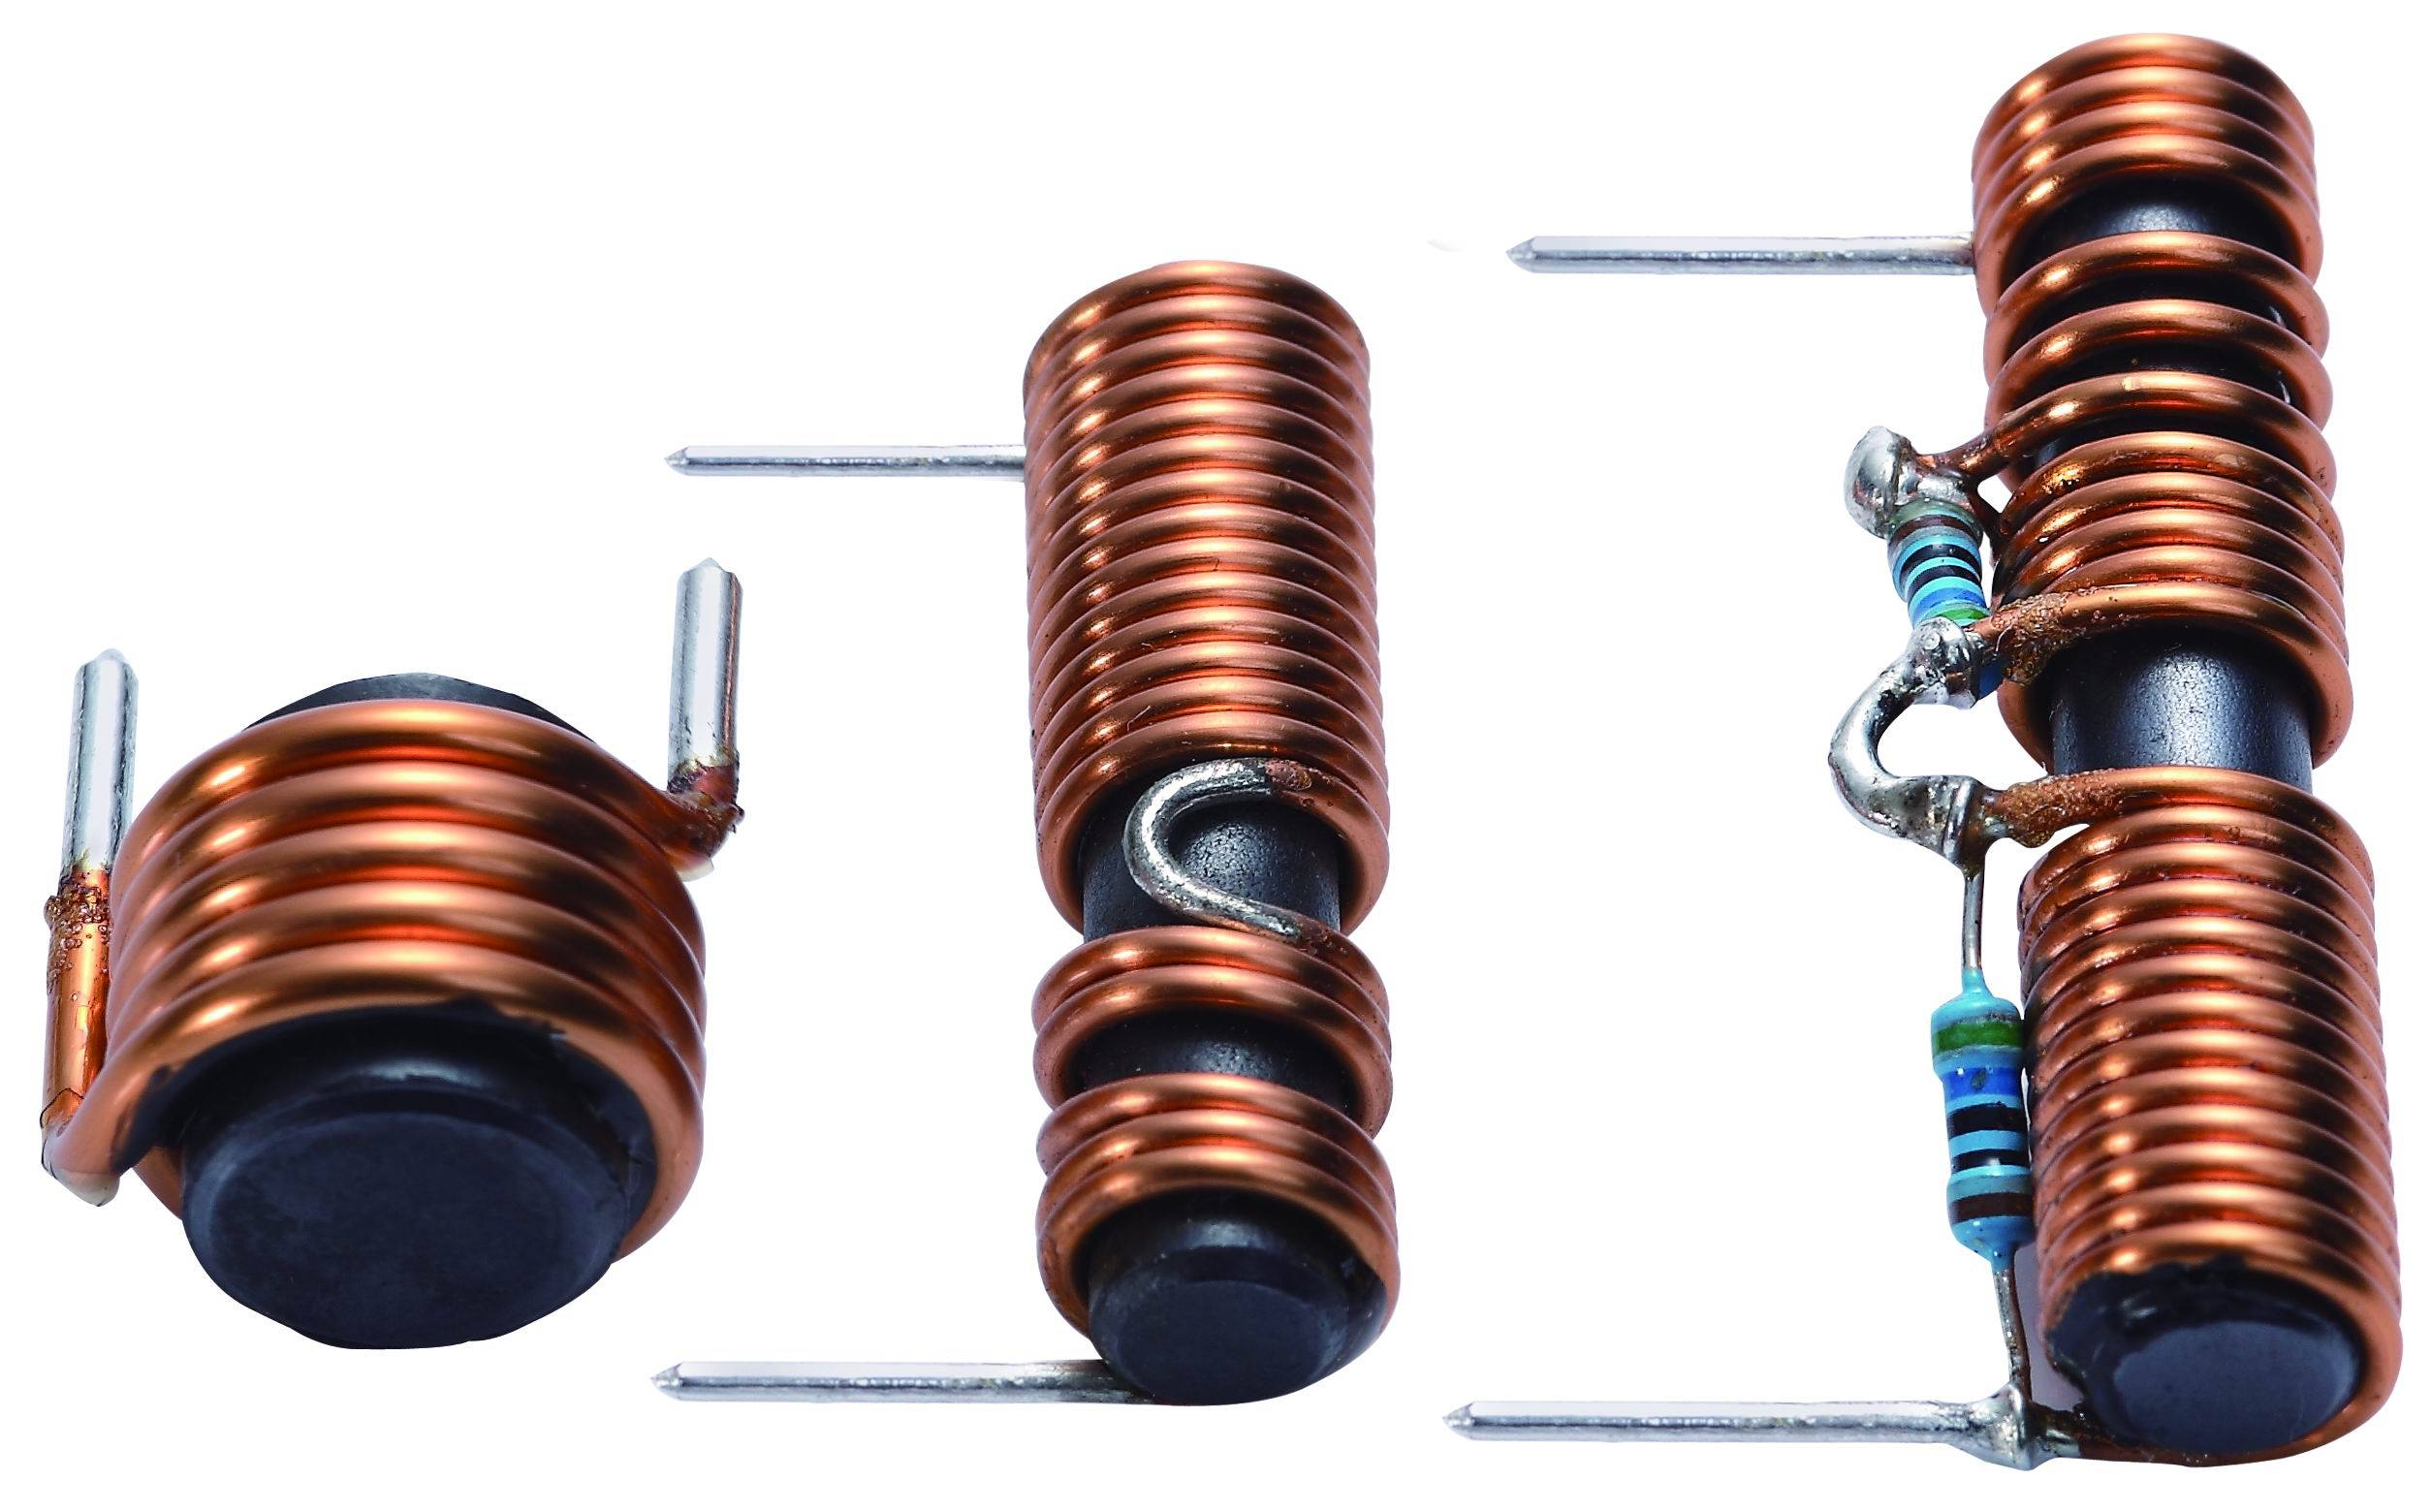 R-type ferrite core, inductor